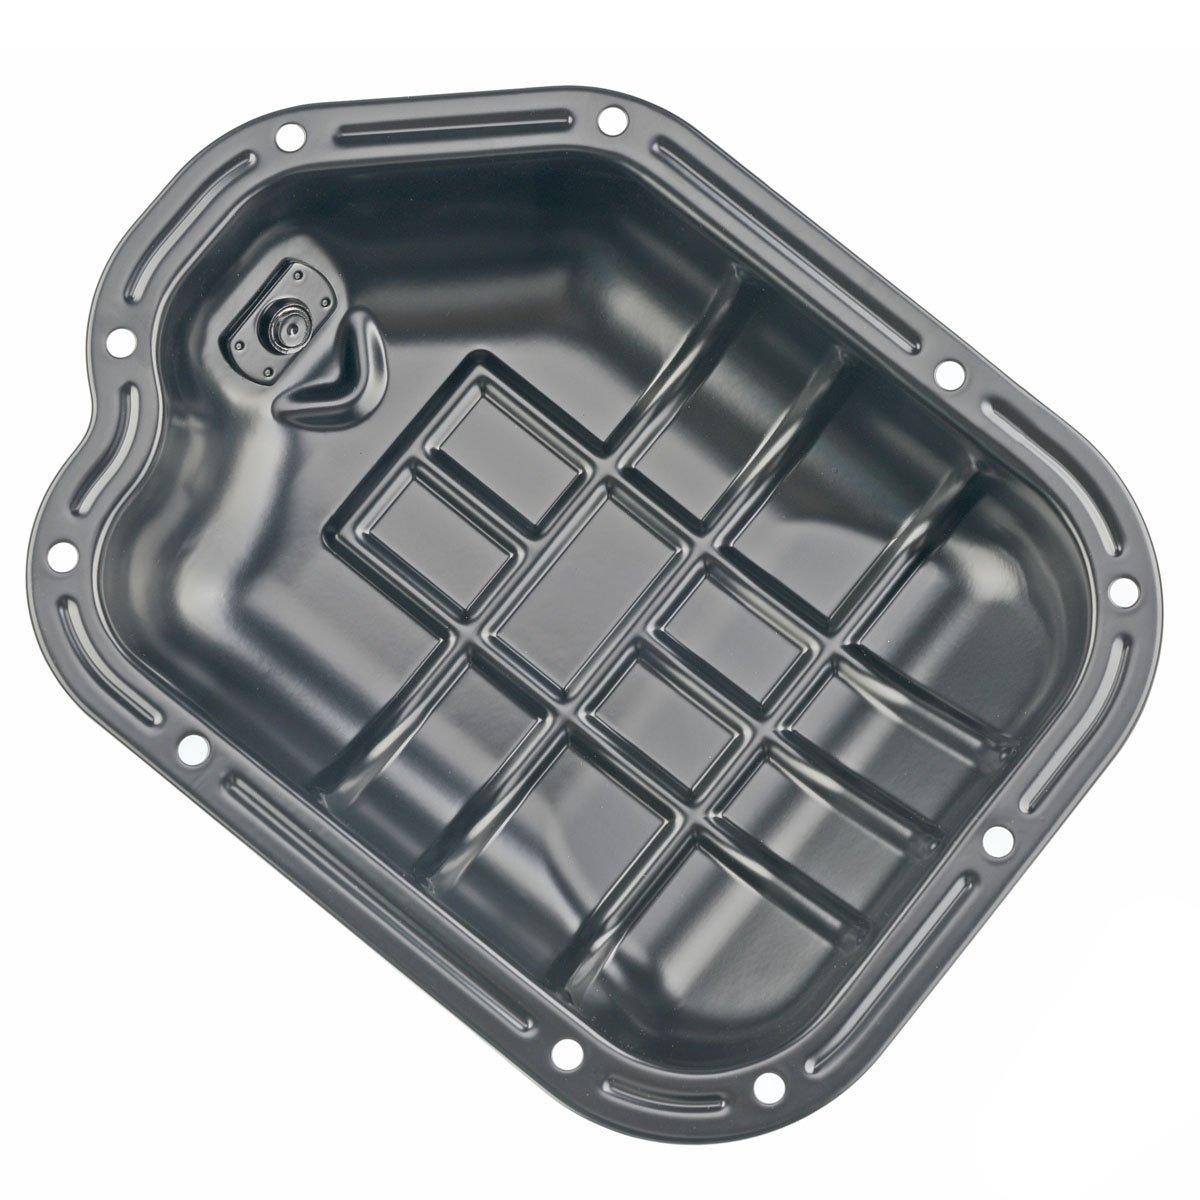 Engine Oil Pan for Nissan Altima 2007-2016 Murano Pathfinder Infiniti QX60 JX35